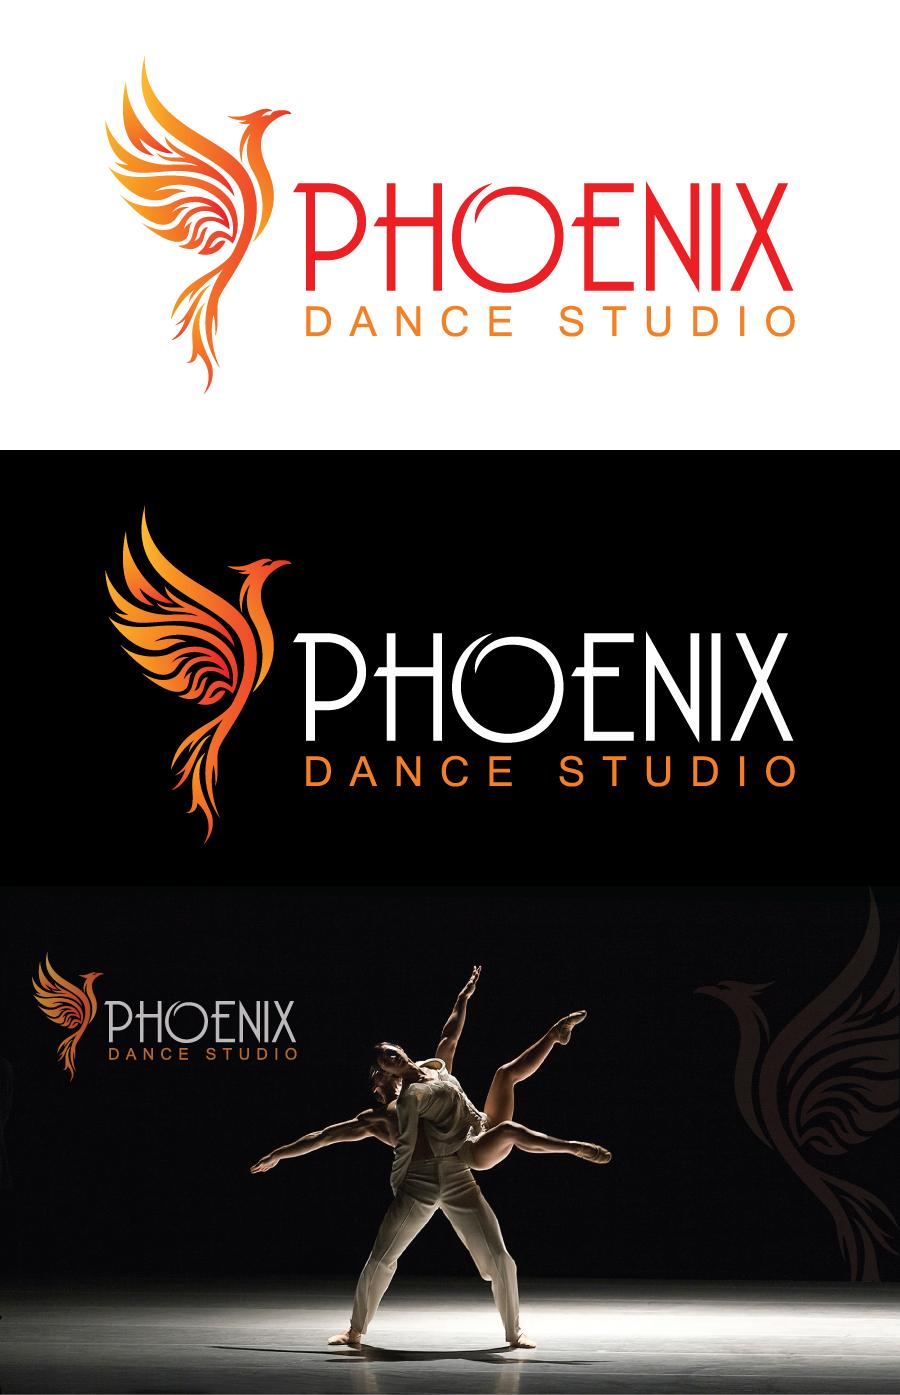 Serious Professional Logo Design For Phoenix Dance Studio